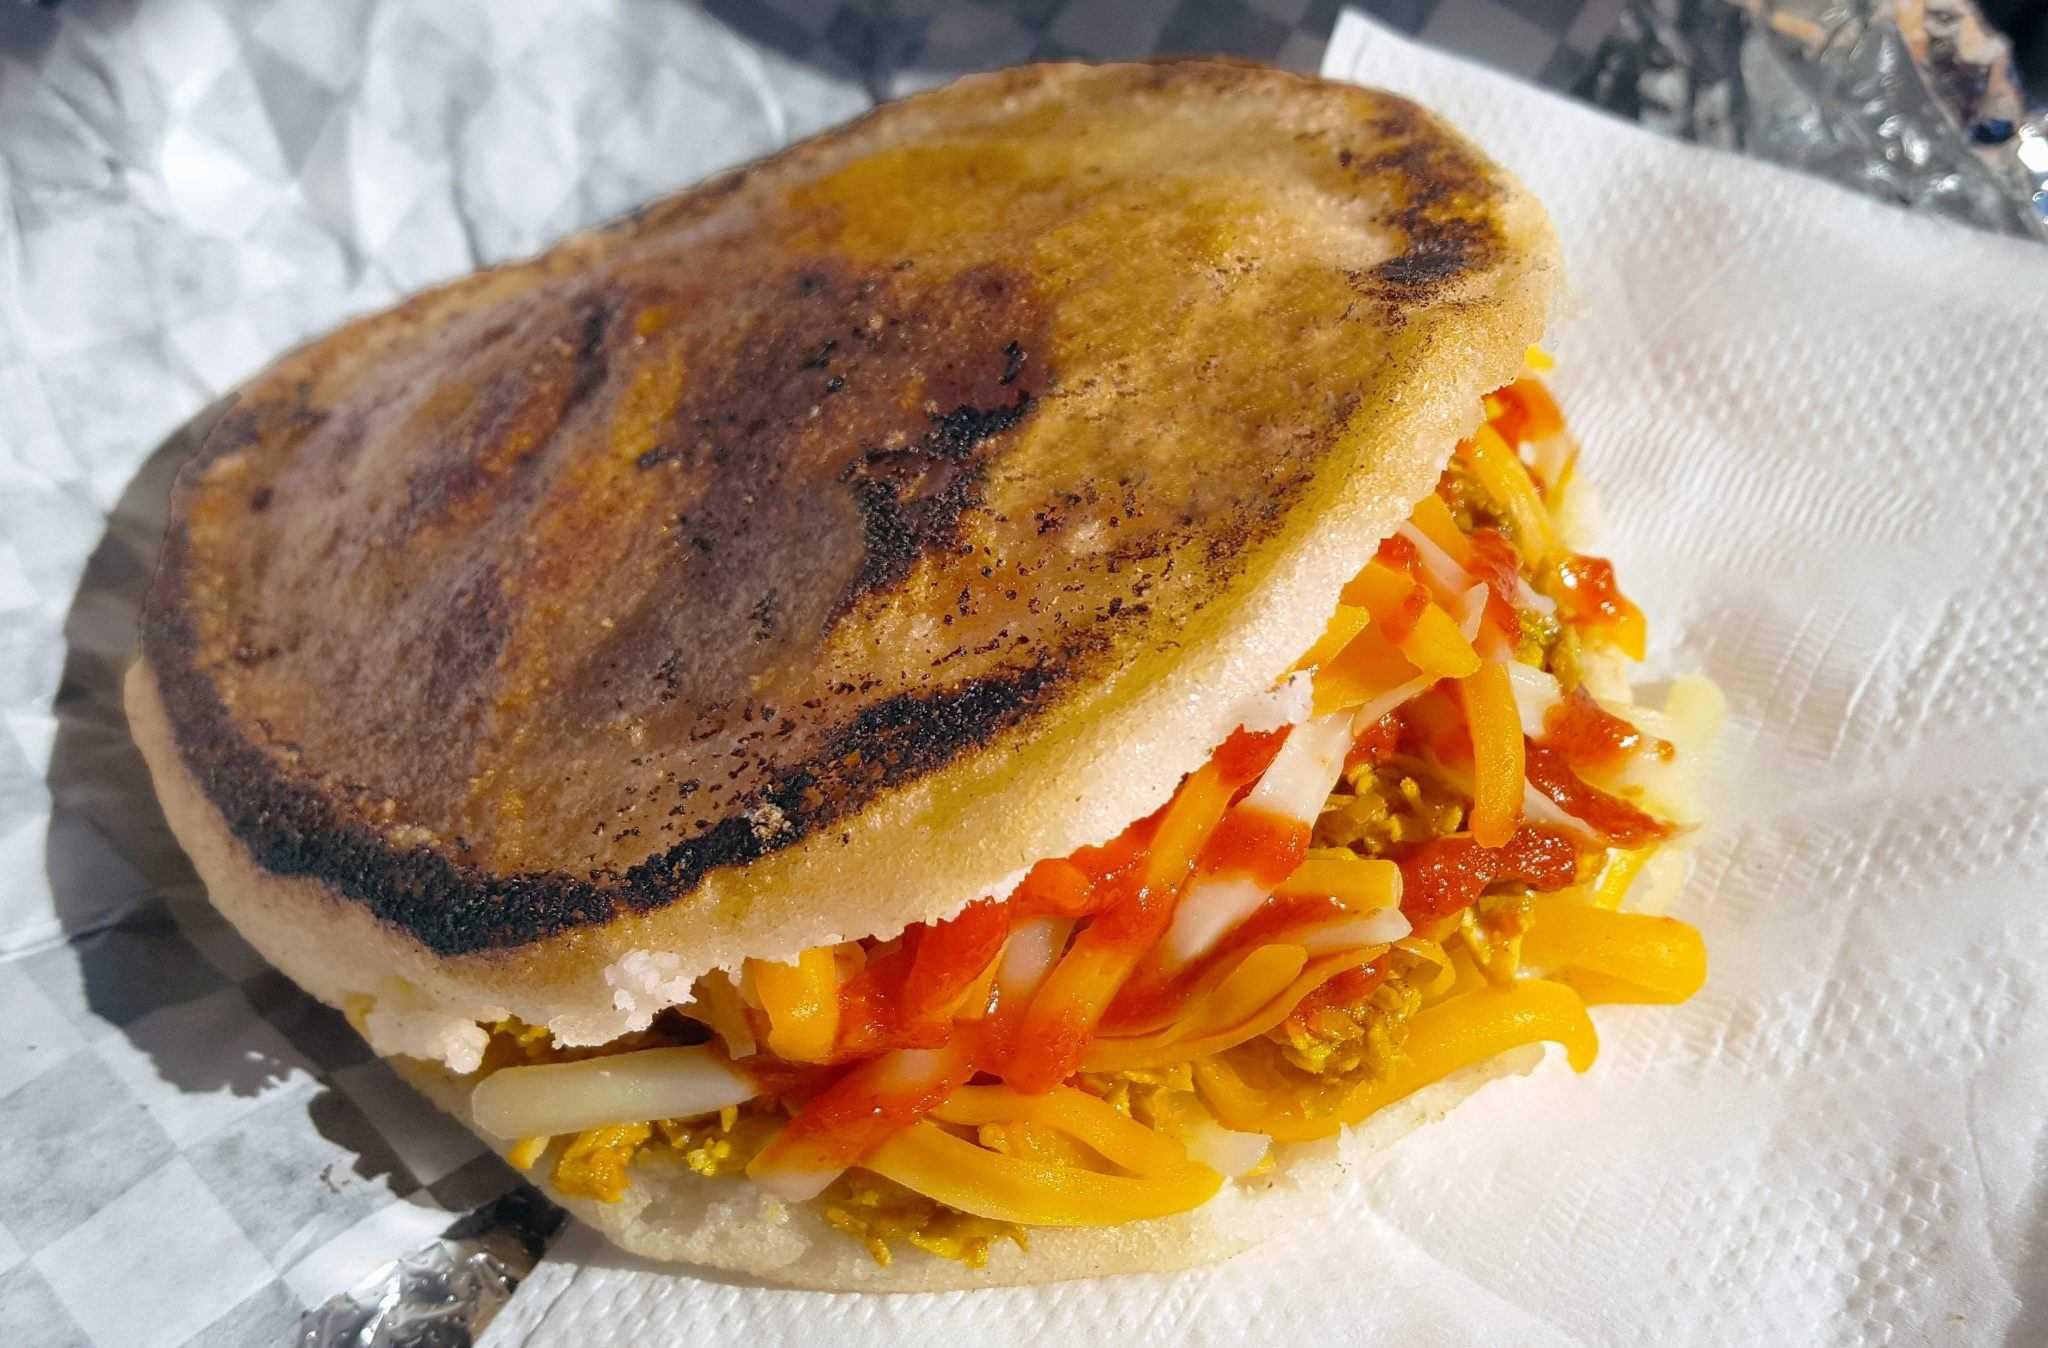 venezuelan colombian arepas on glutto